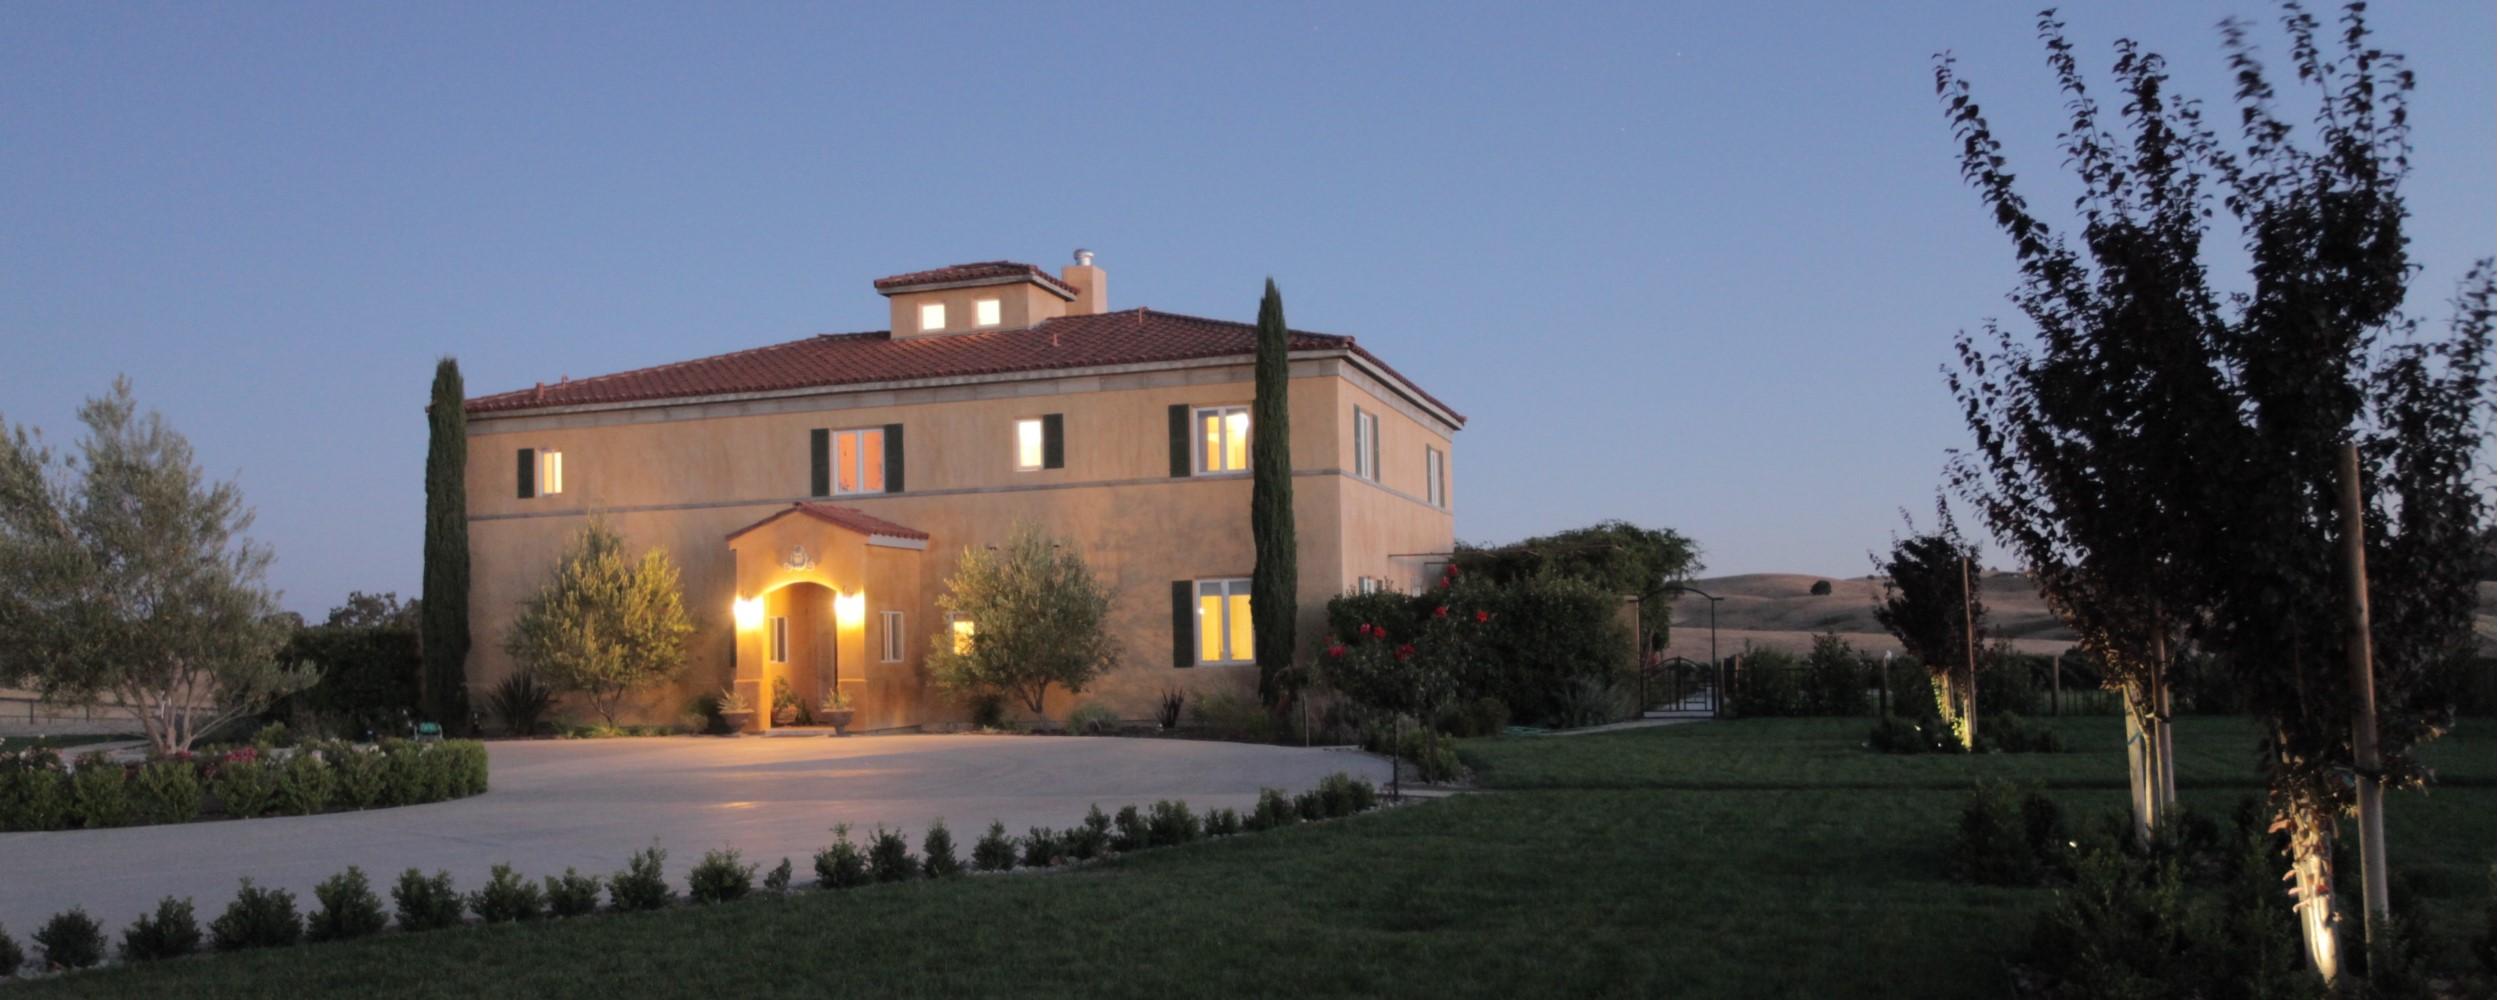 Home - House_Night - 2500x1000